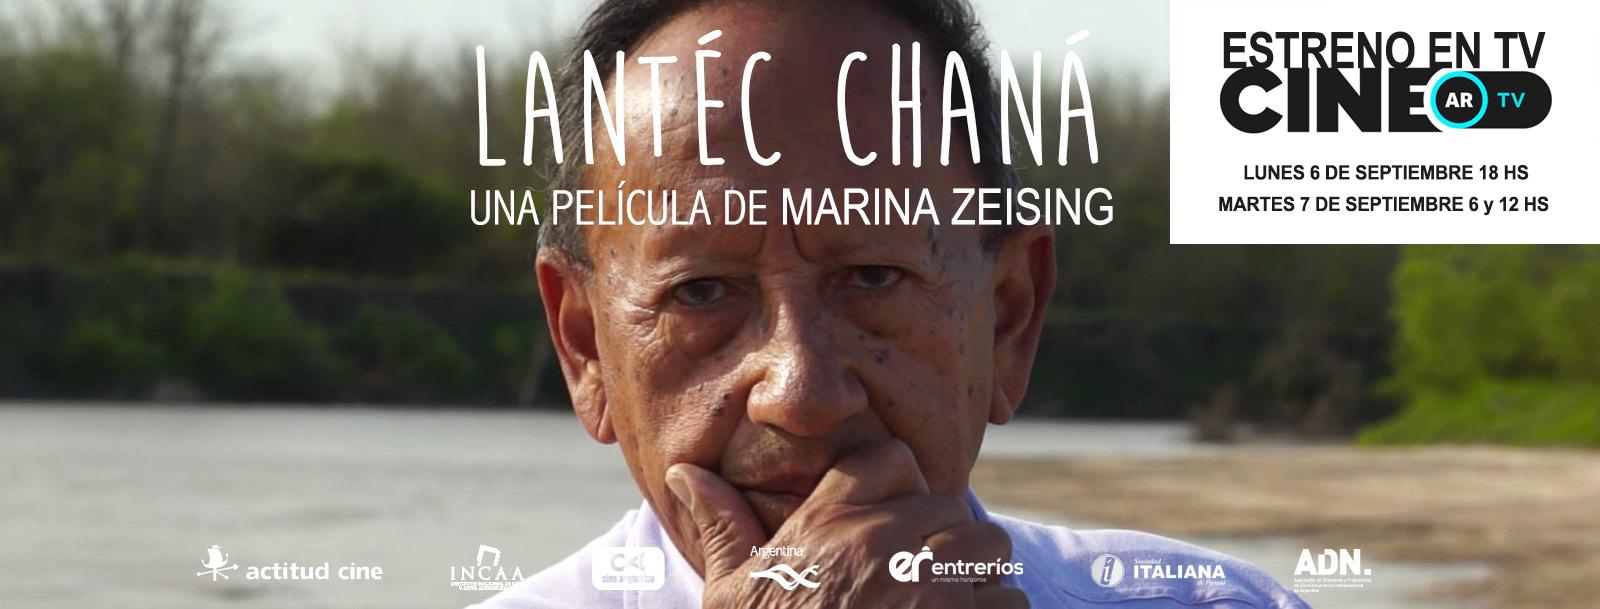 LANTÉC CHANÁ continúa en TV